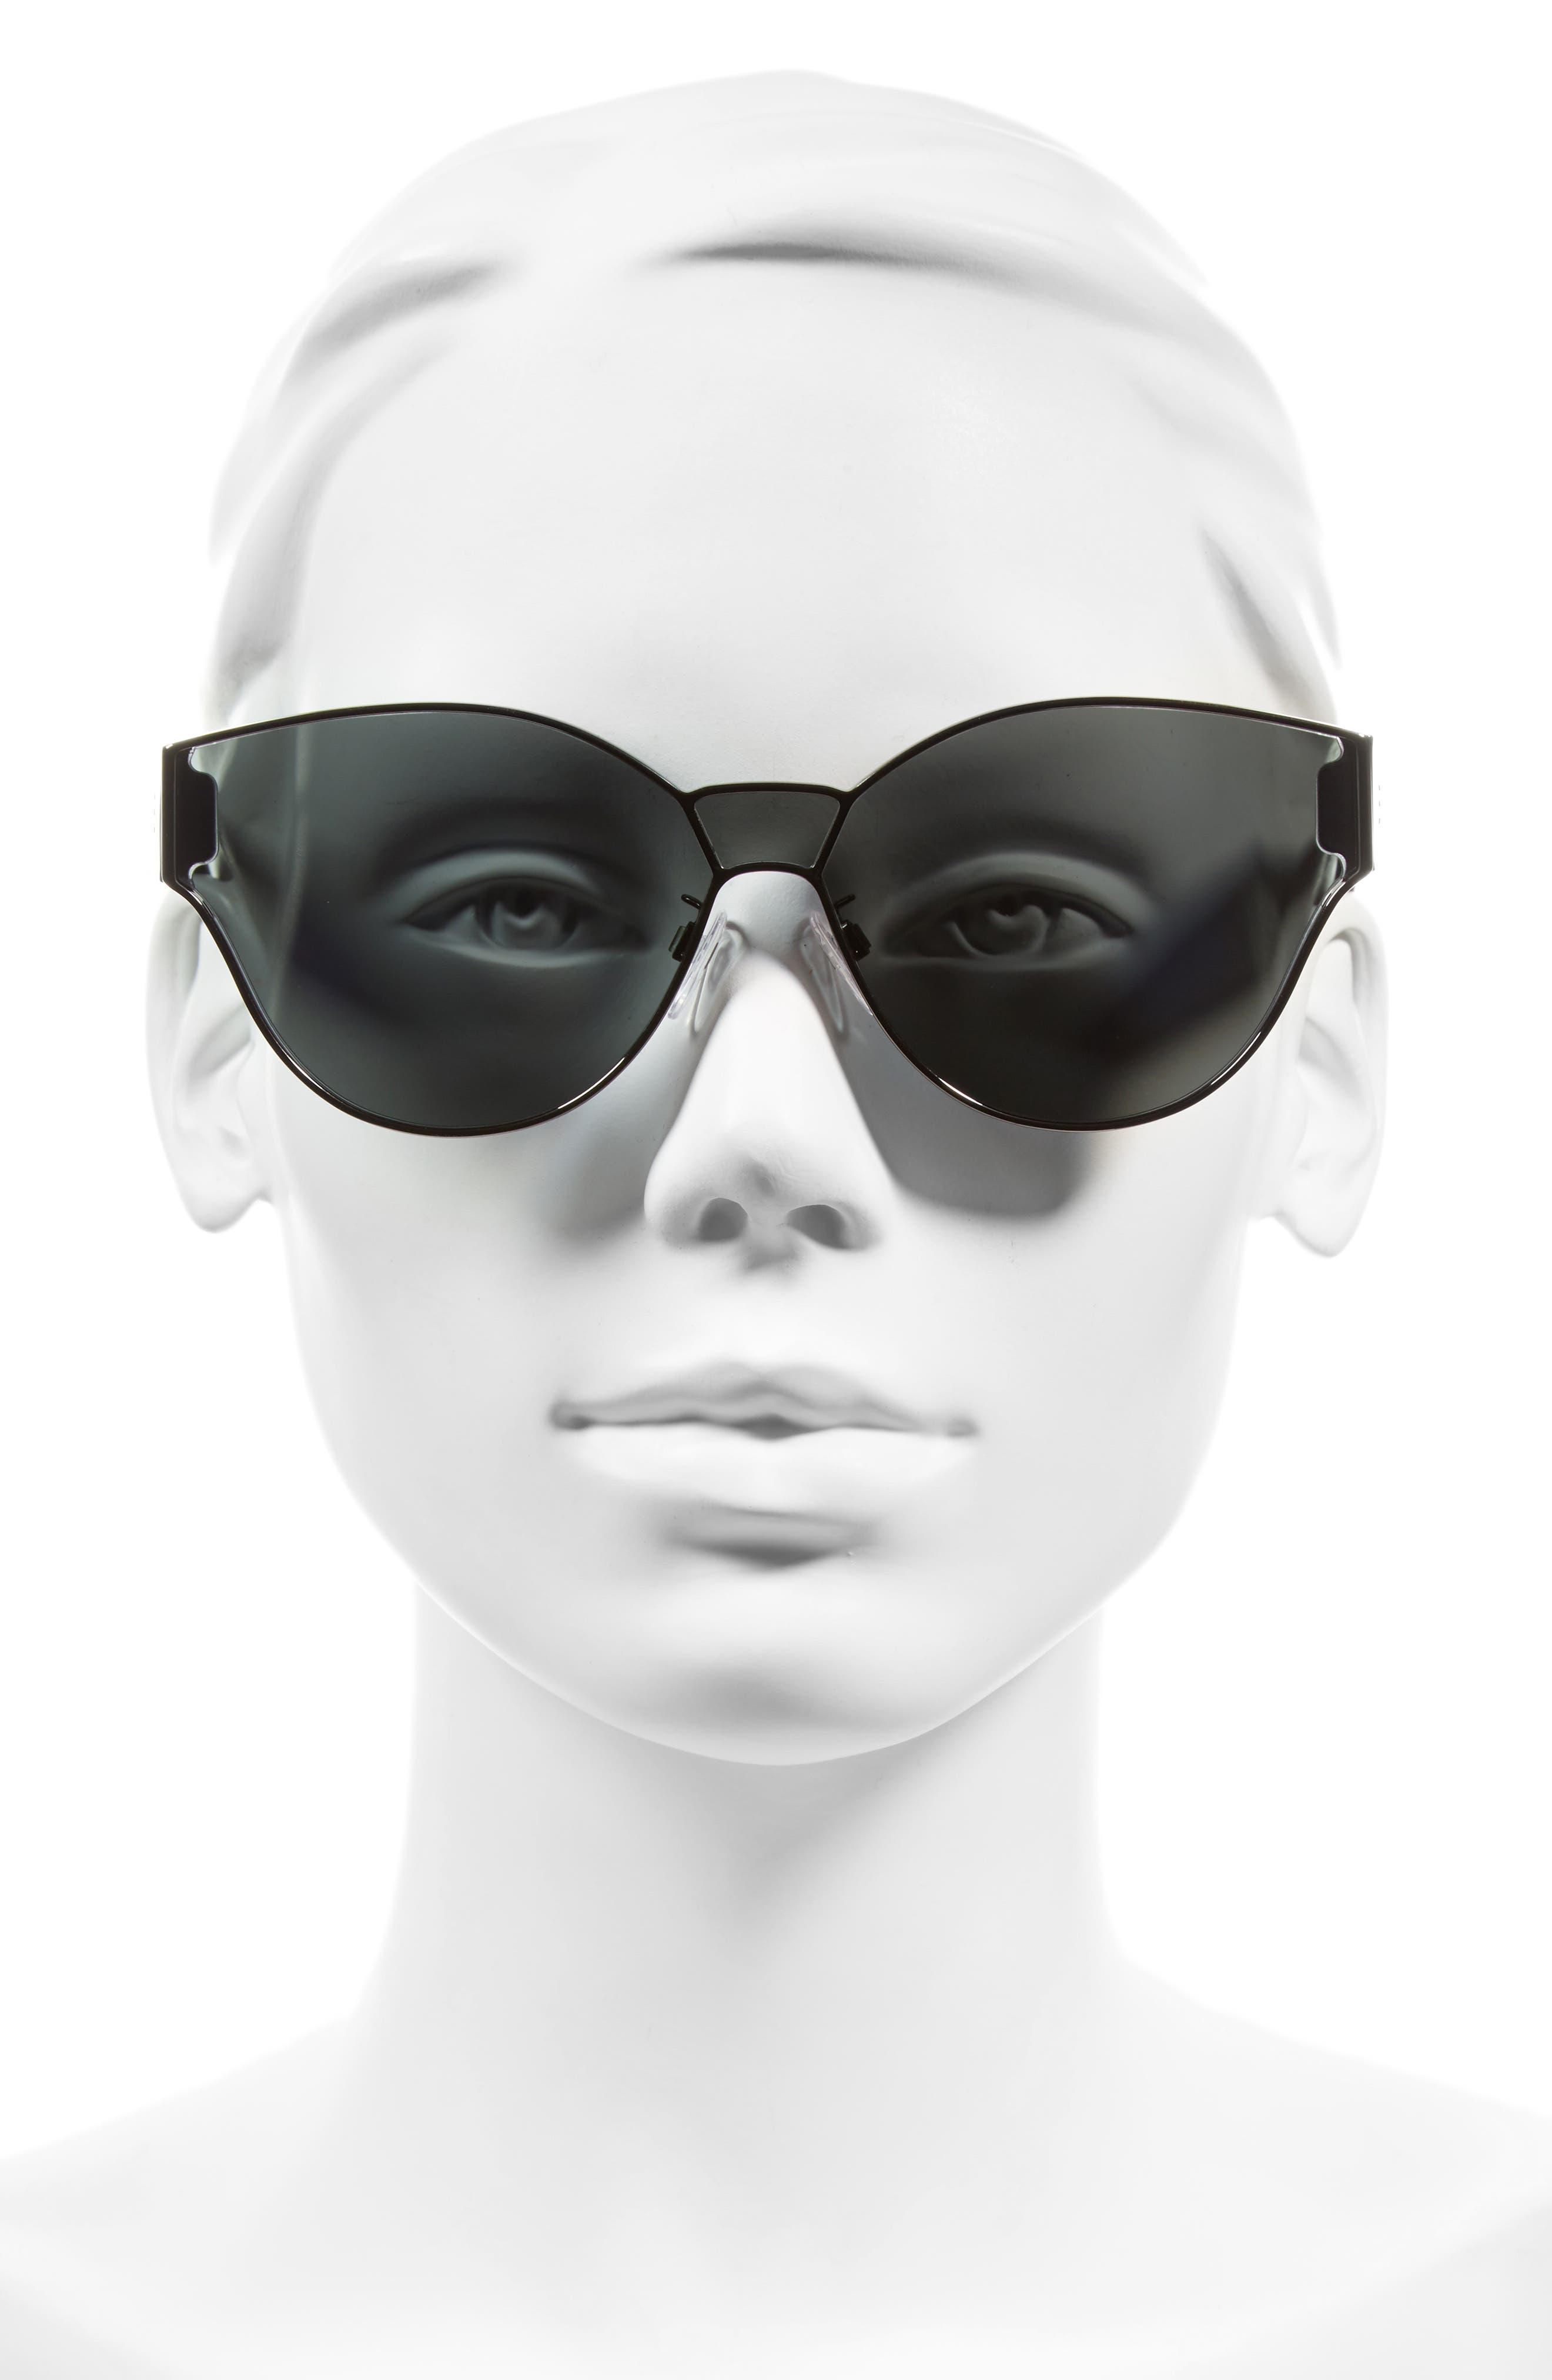 65mm Sunglasses,                             Alternate thumbnail 3, color,                             040